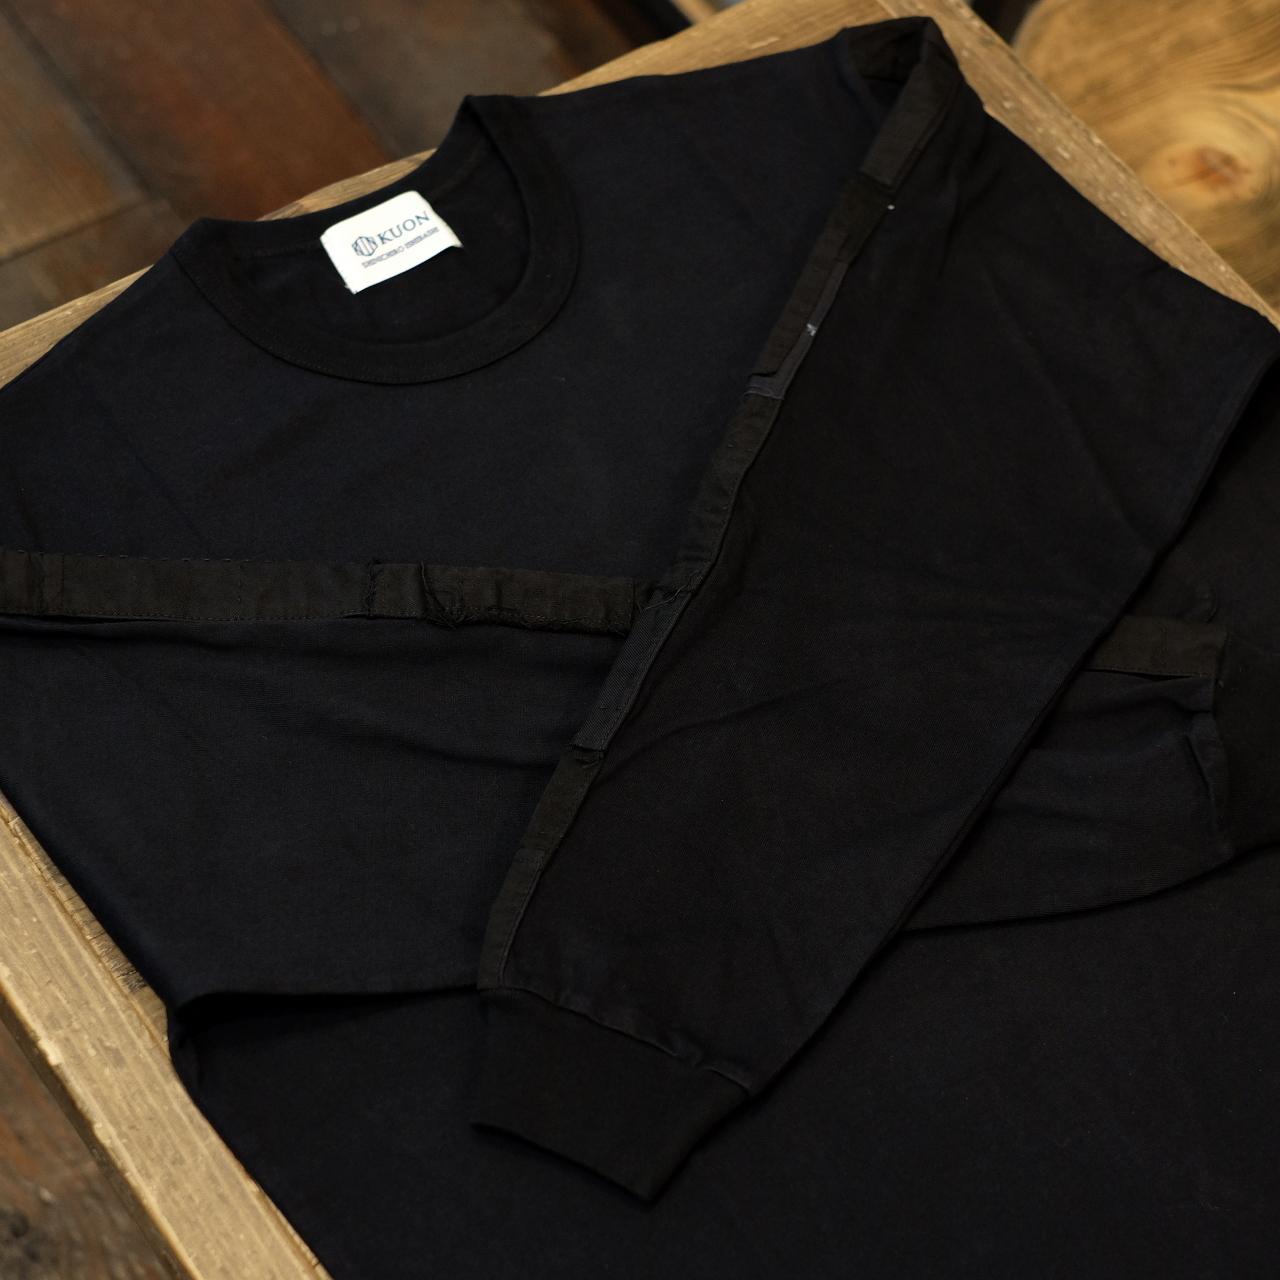 KUON(クオン) アップサイクル トリミングロングTシャツ ブラック×ブラック